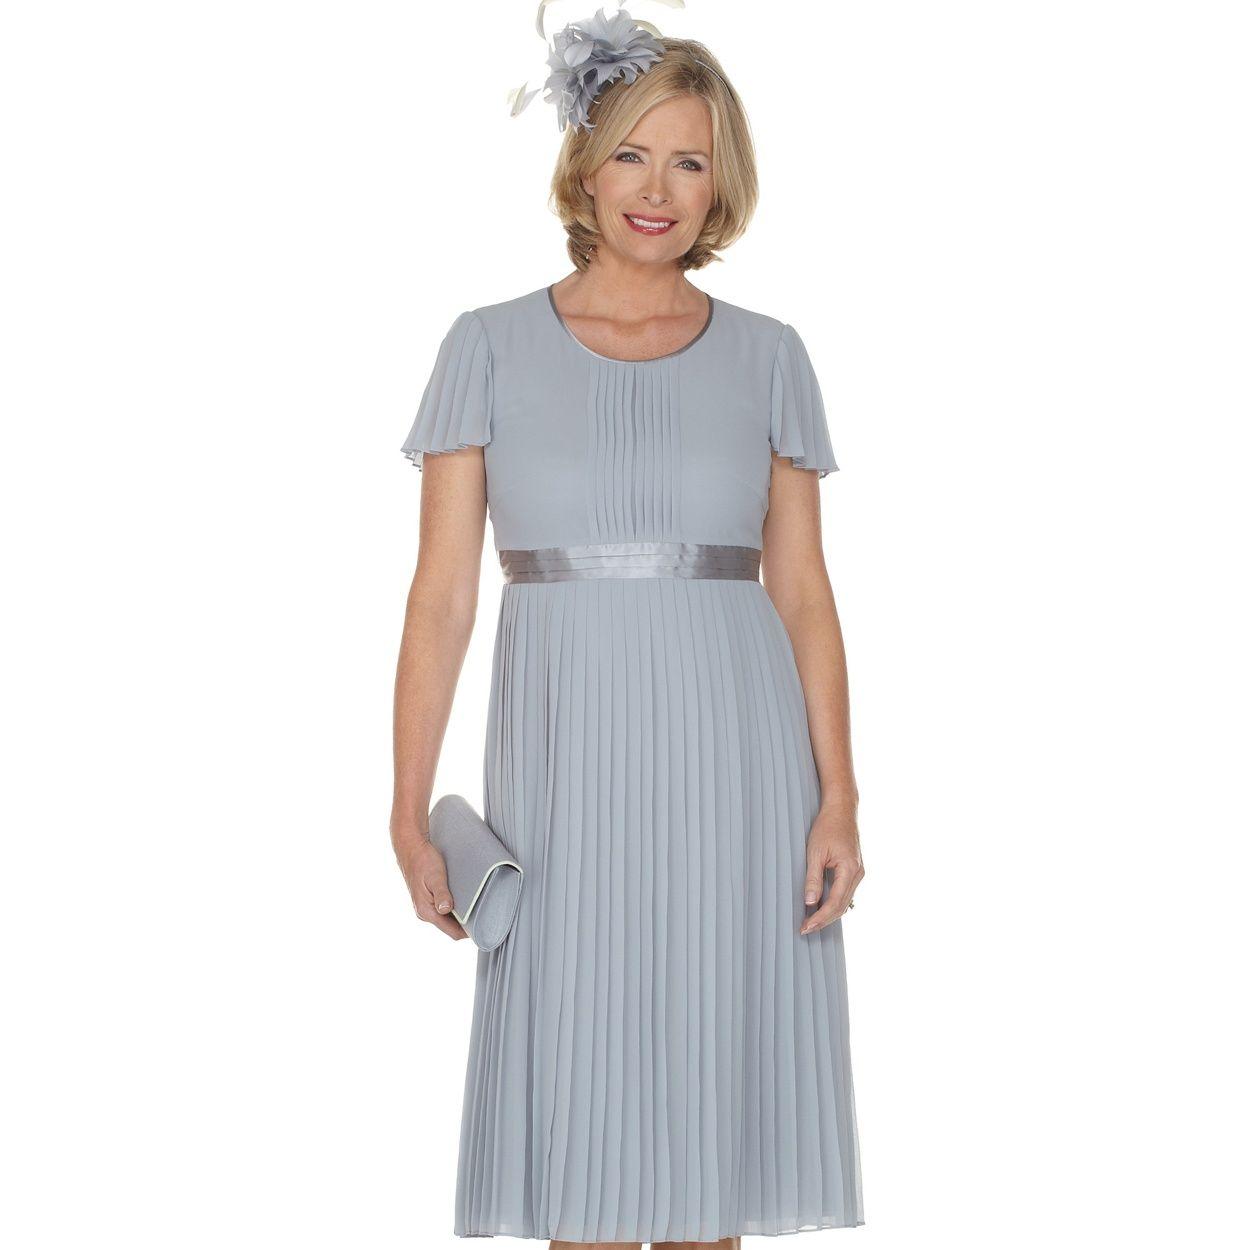 Jacques Vert Zinc Chiffon Pleated Dress- At Debenhams.com